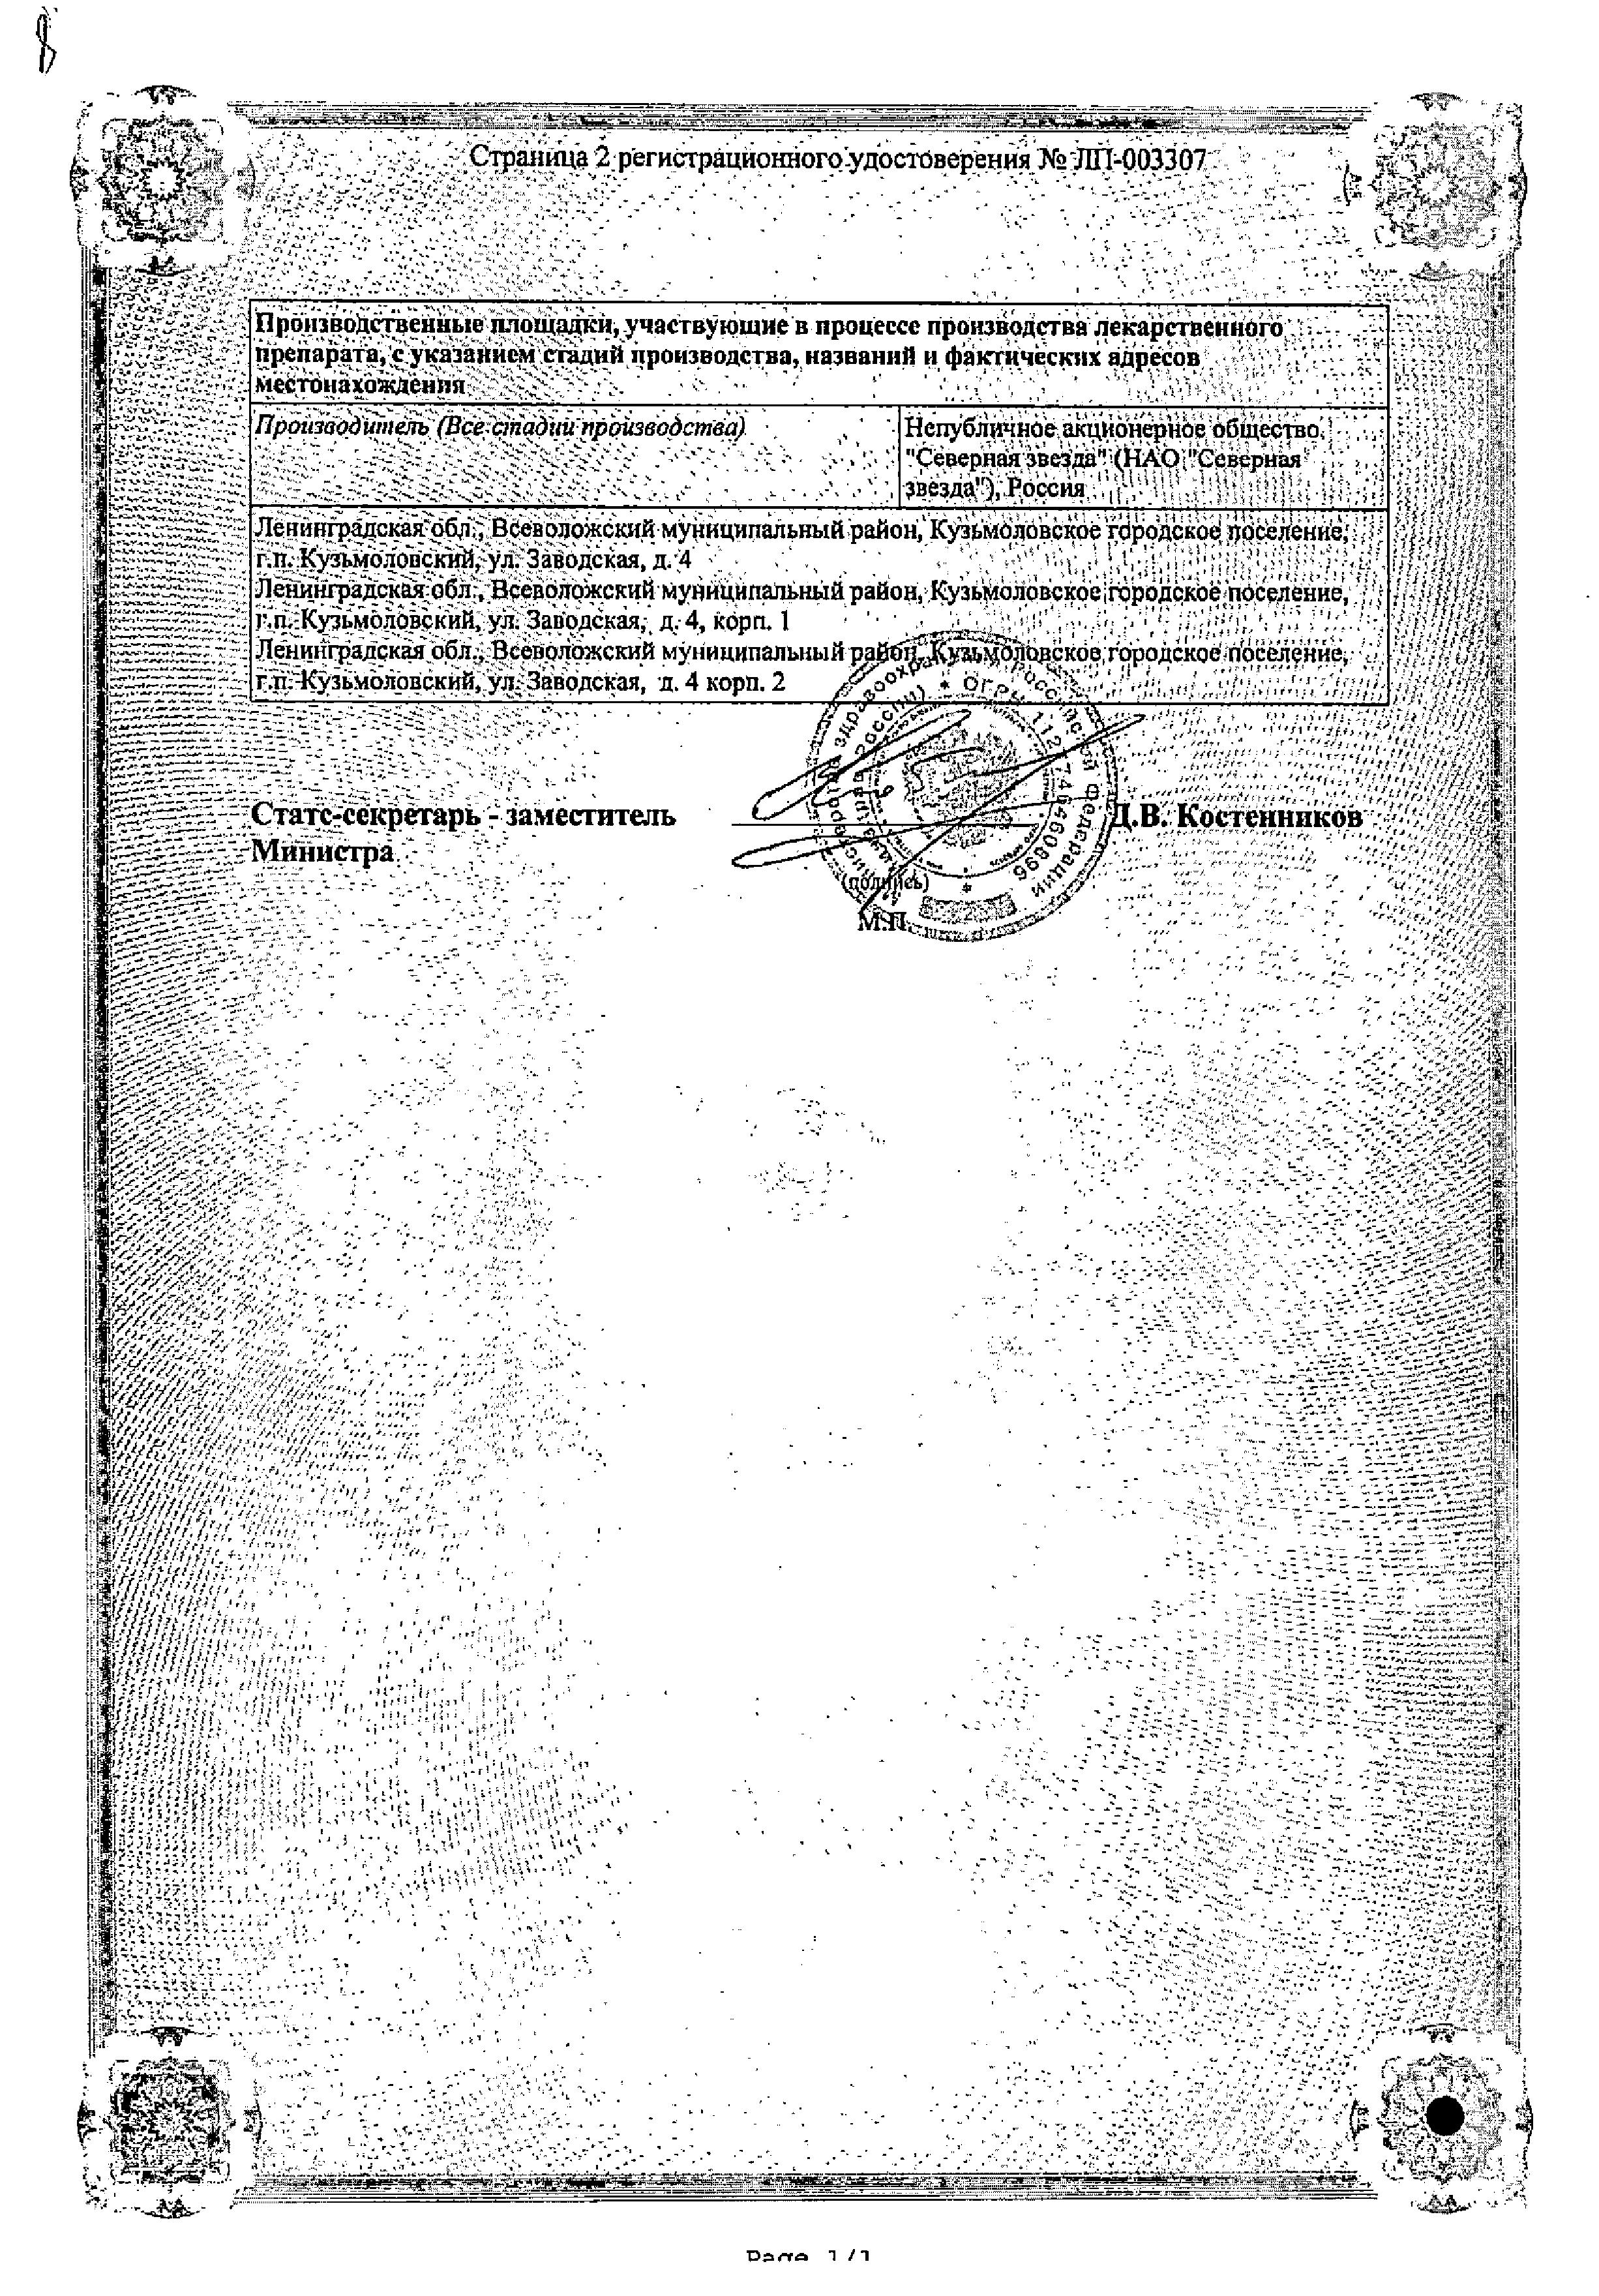 Торасемид-СЗ сертификат